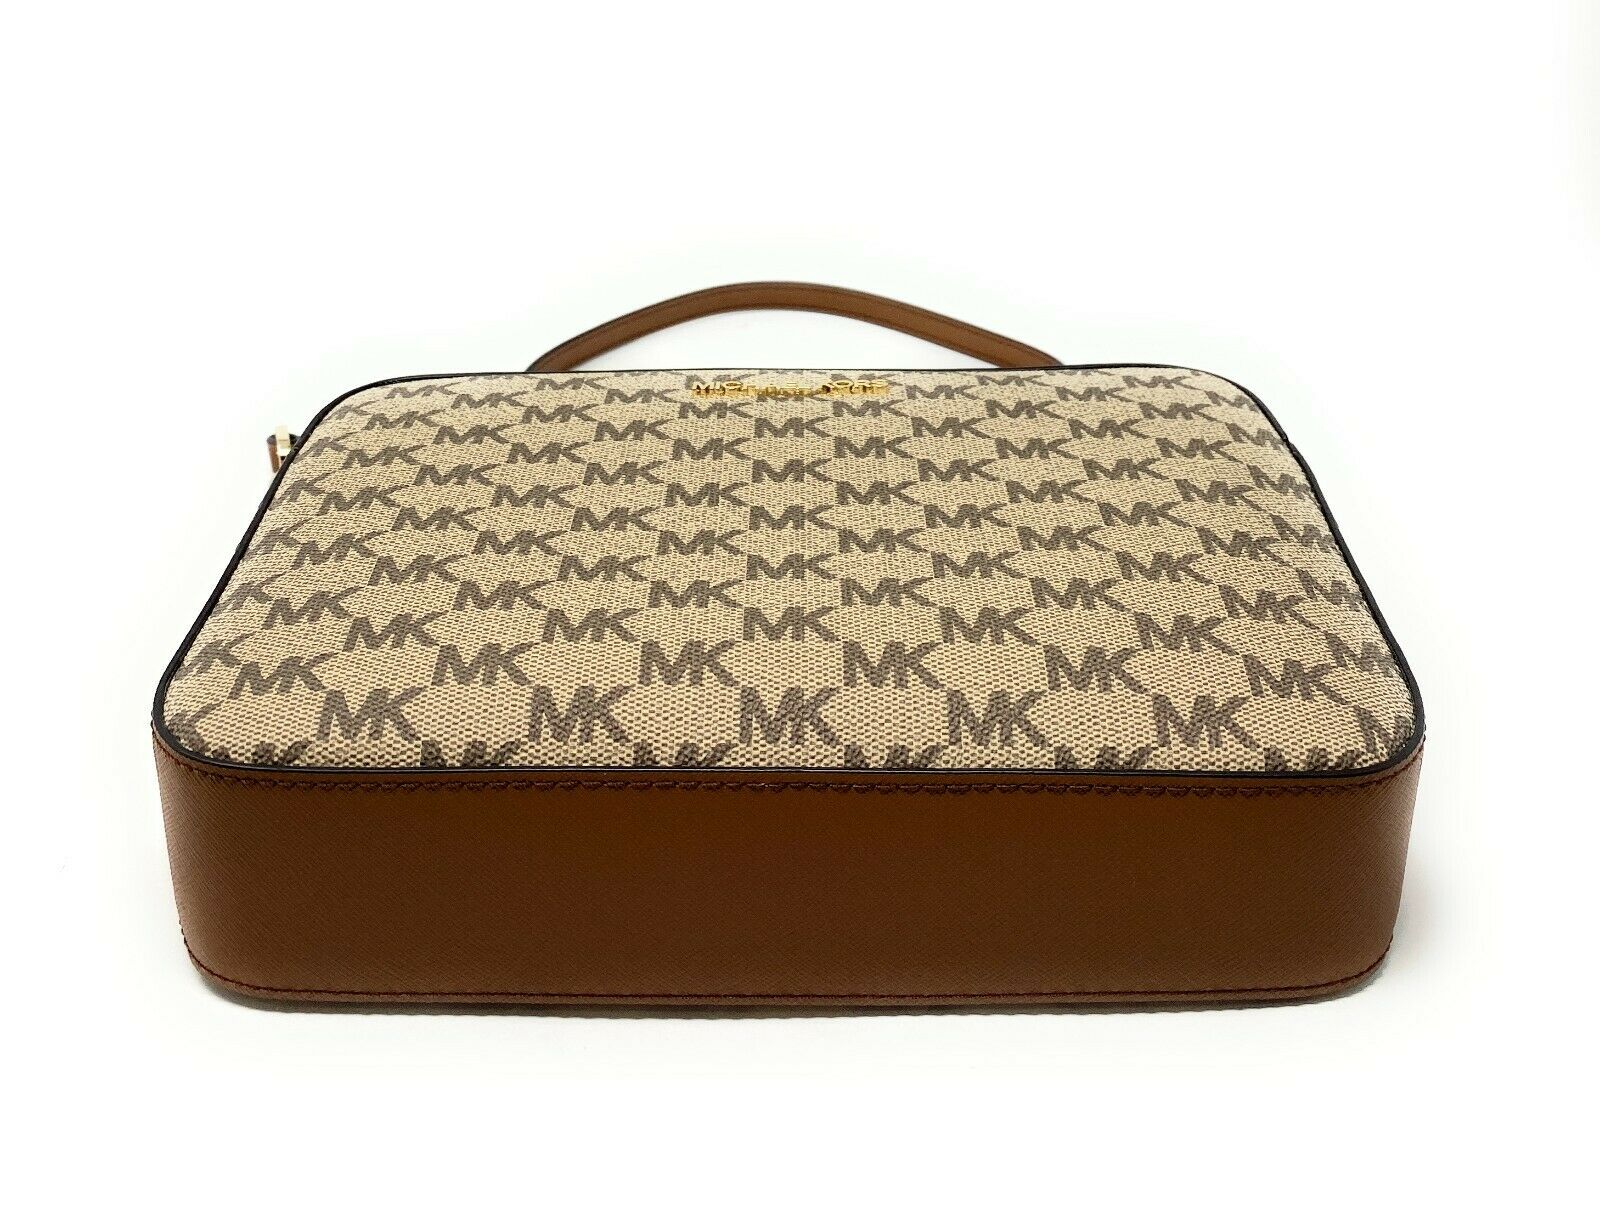 thumbnail 72 - Michael Kors Jet Set Item Large East West Crossbody Chain Handbag Clutch $298